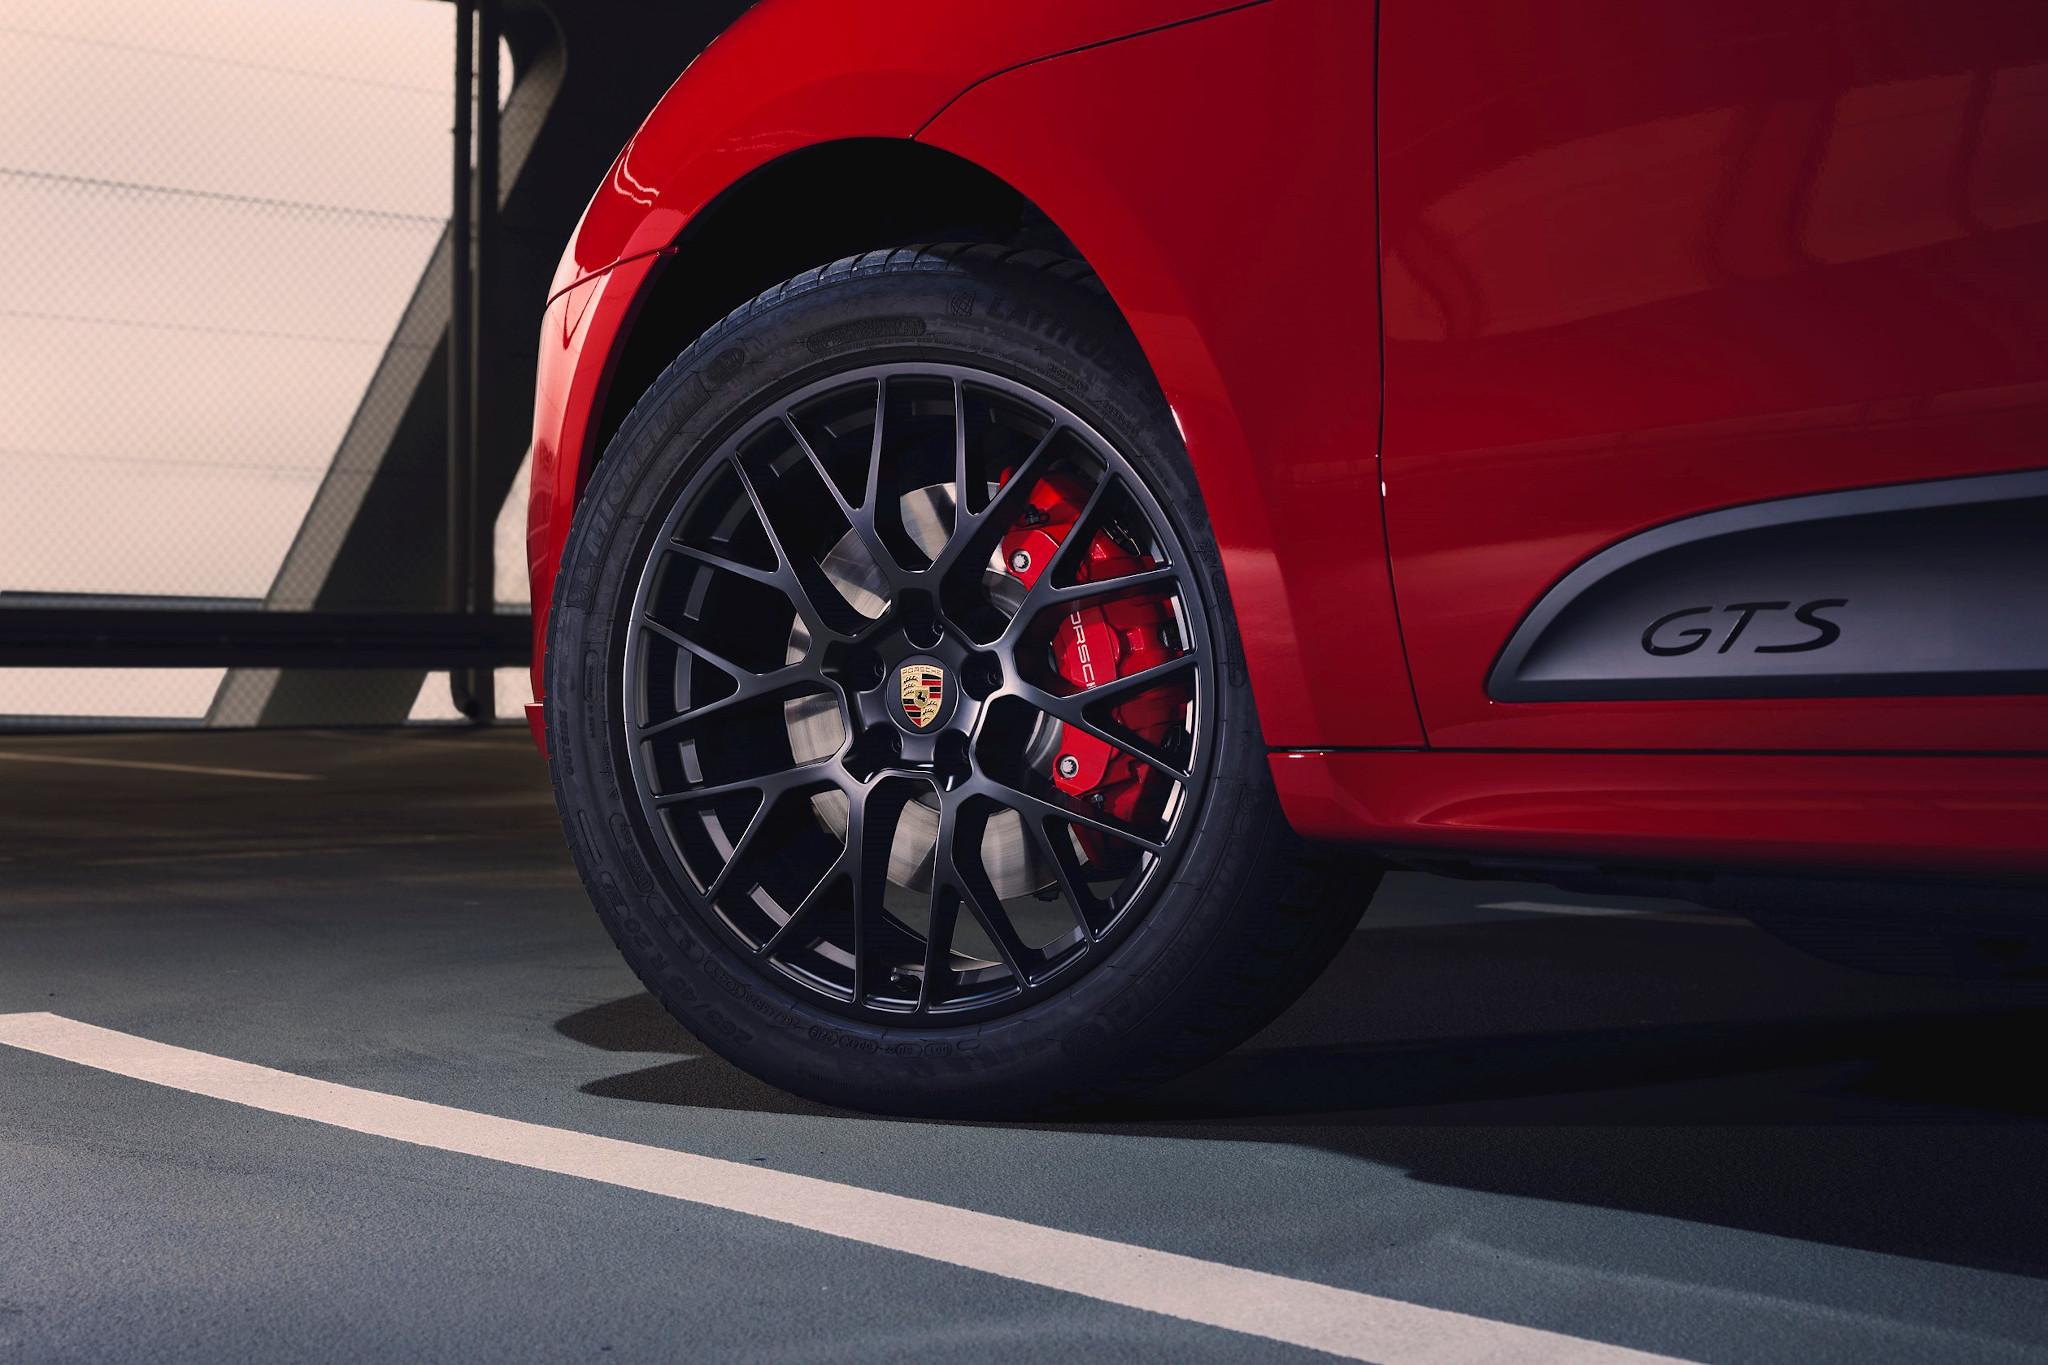 2021 Porsche Macan Redesign Turbo Gts And Specs >> 2020 Porsche Macan Gts Electric Can Wait News Cars Com